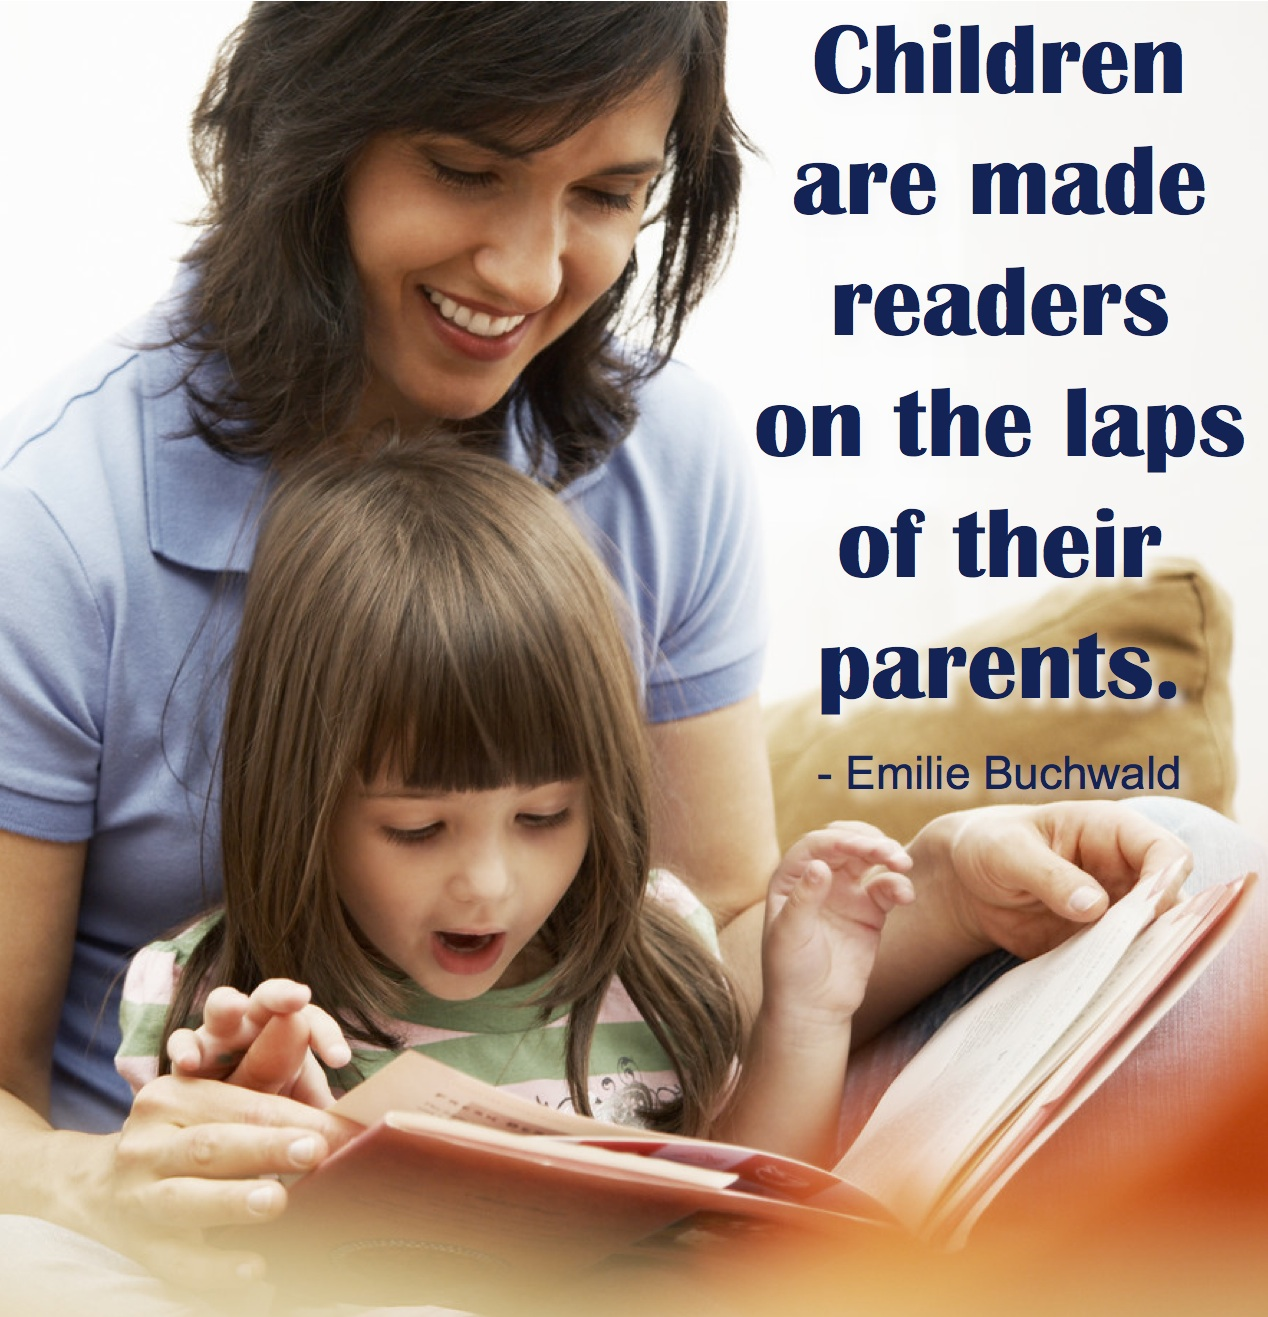 Prescott Publishing Salutes Parents